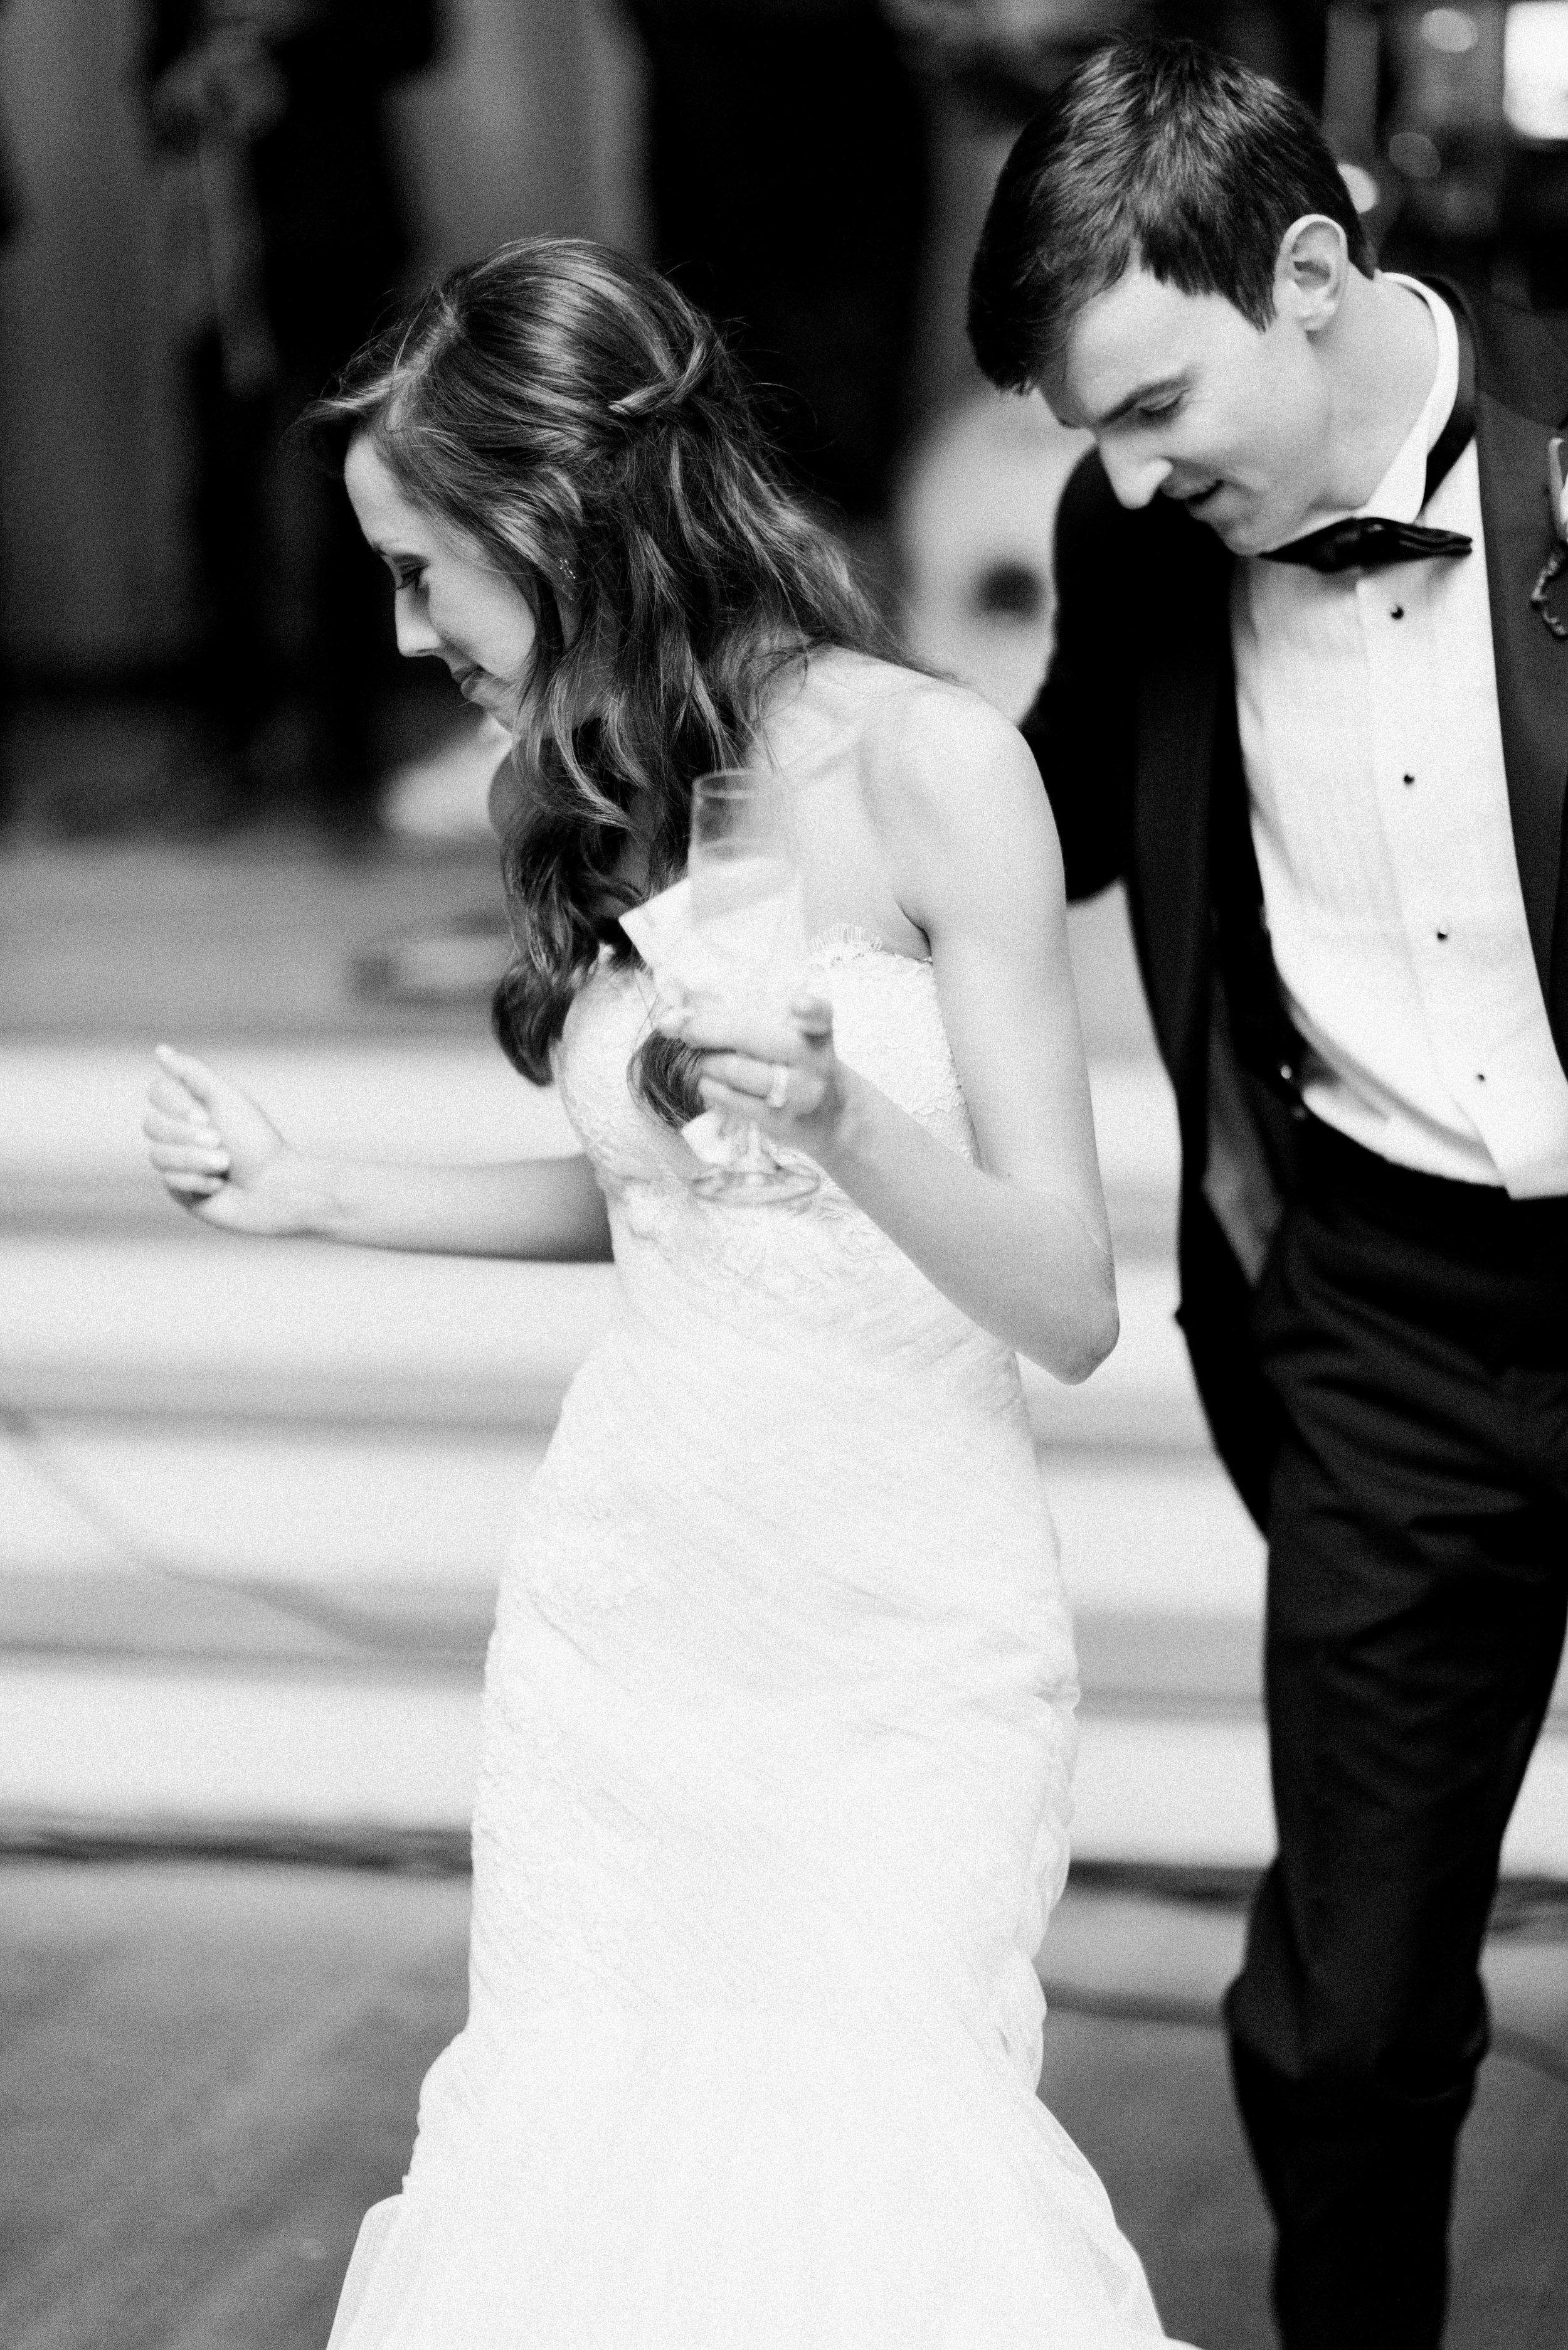 St.-Philip-Presbyterian-Church-Houston-Wedding-Ceremony-The-Junior-League-Of-Houston-Reception-Dana-Fernandez-Photography-Fine-Art-Film-31.jpg